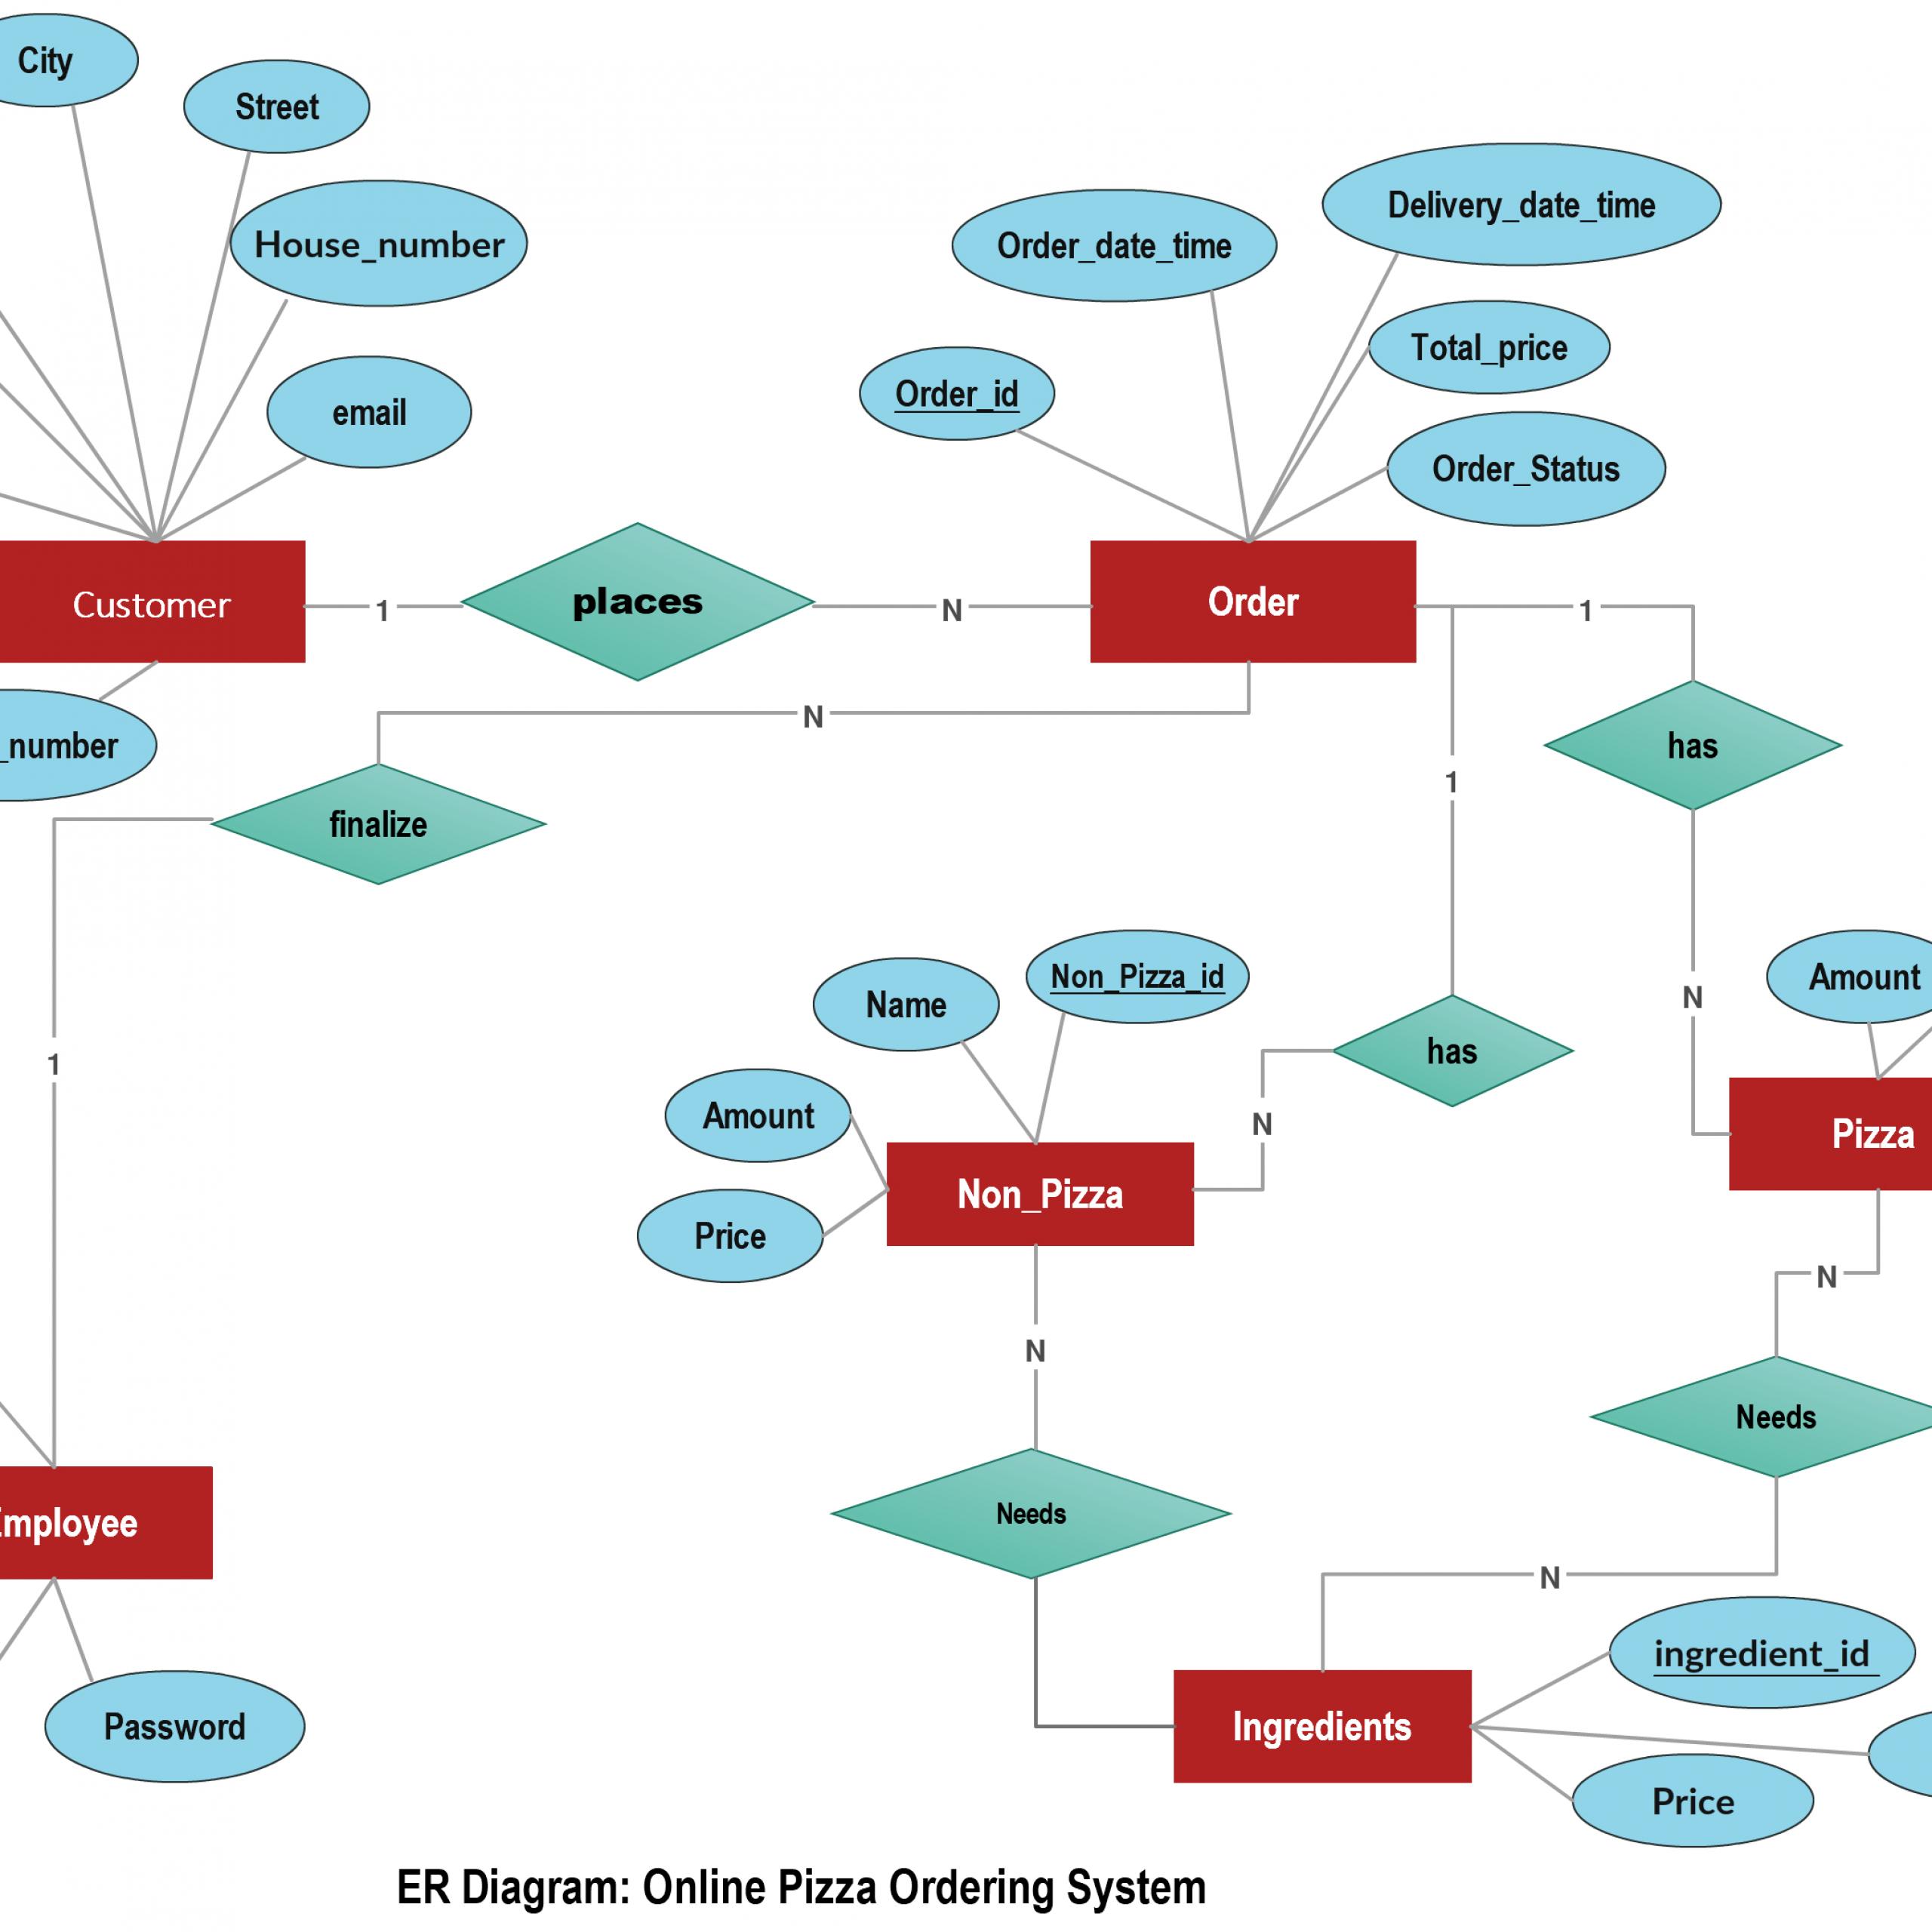 Online Pizza Ordering System Illustrated Using An Er Diagram in Eer Diagram Online